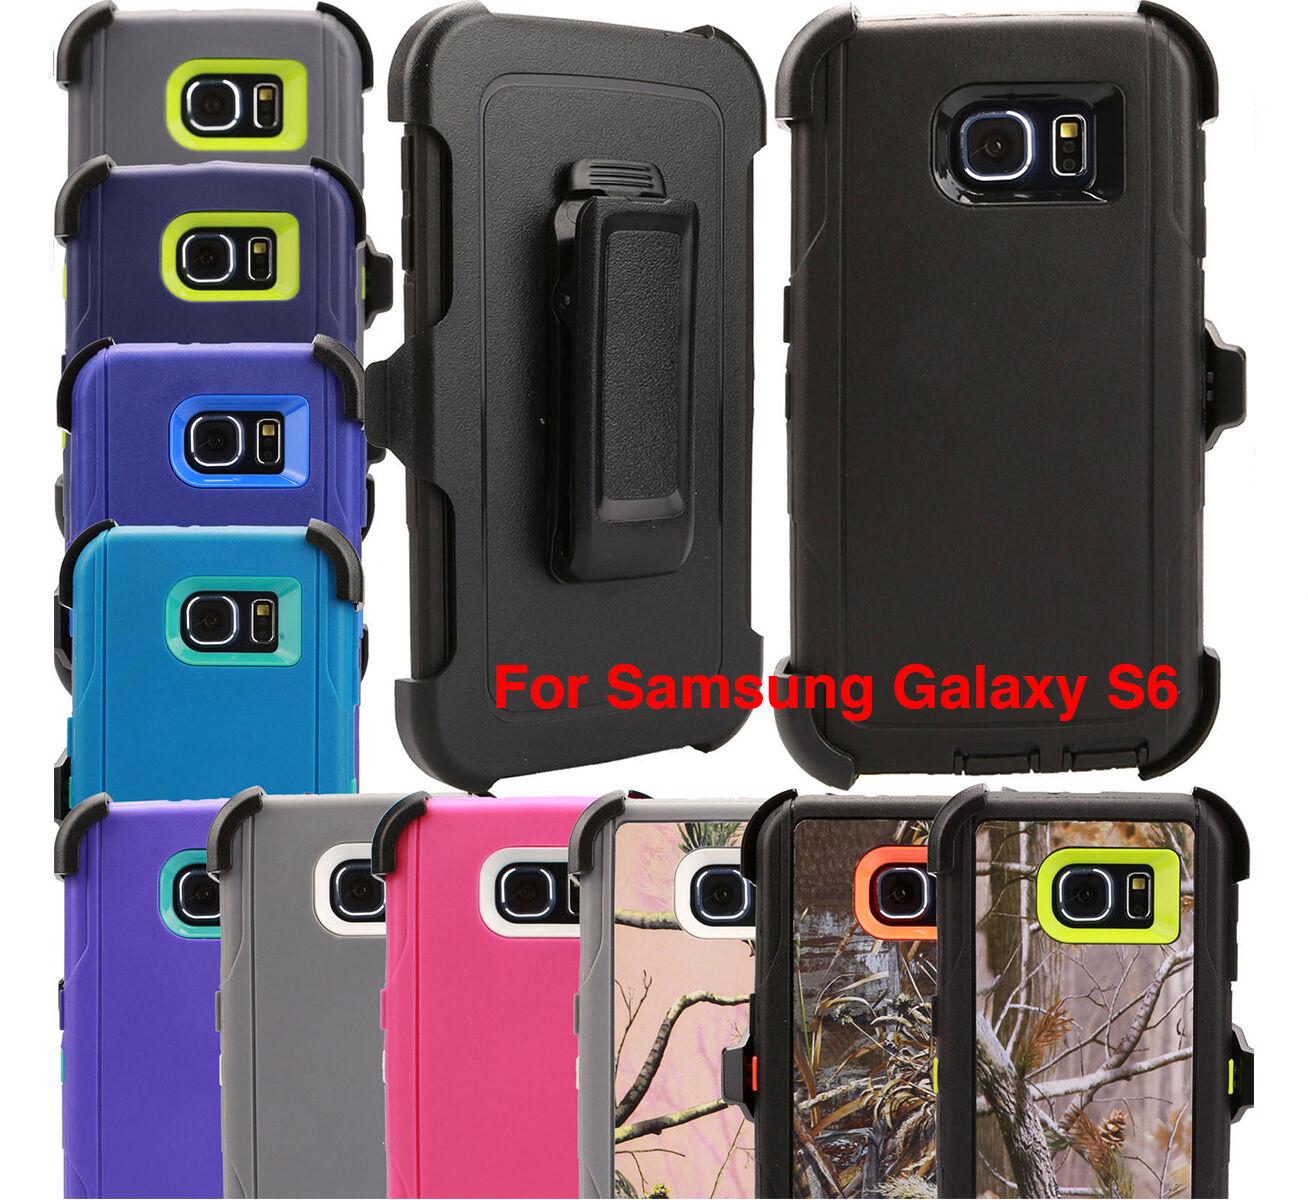 For Samsung Galaxy S6 Regular Case (Belt Holster Fits